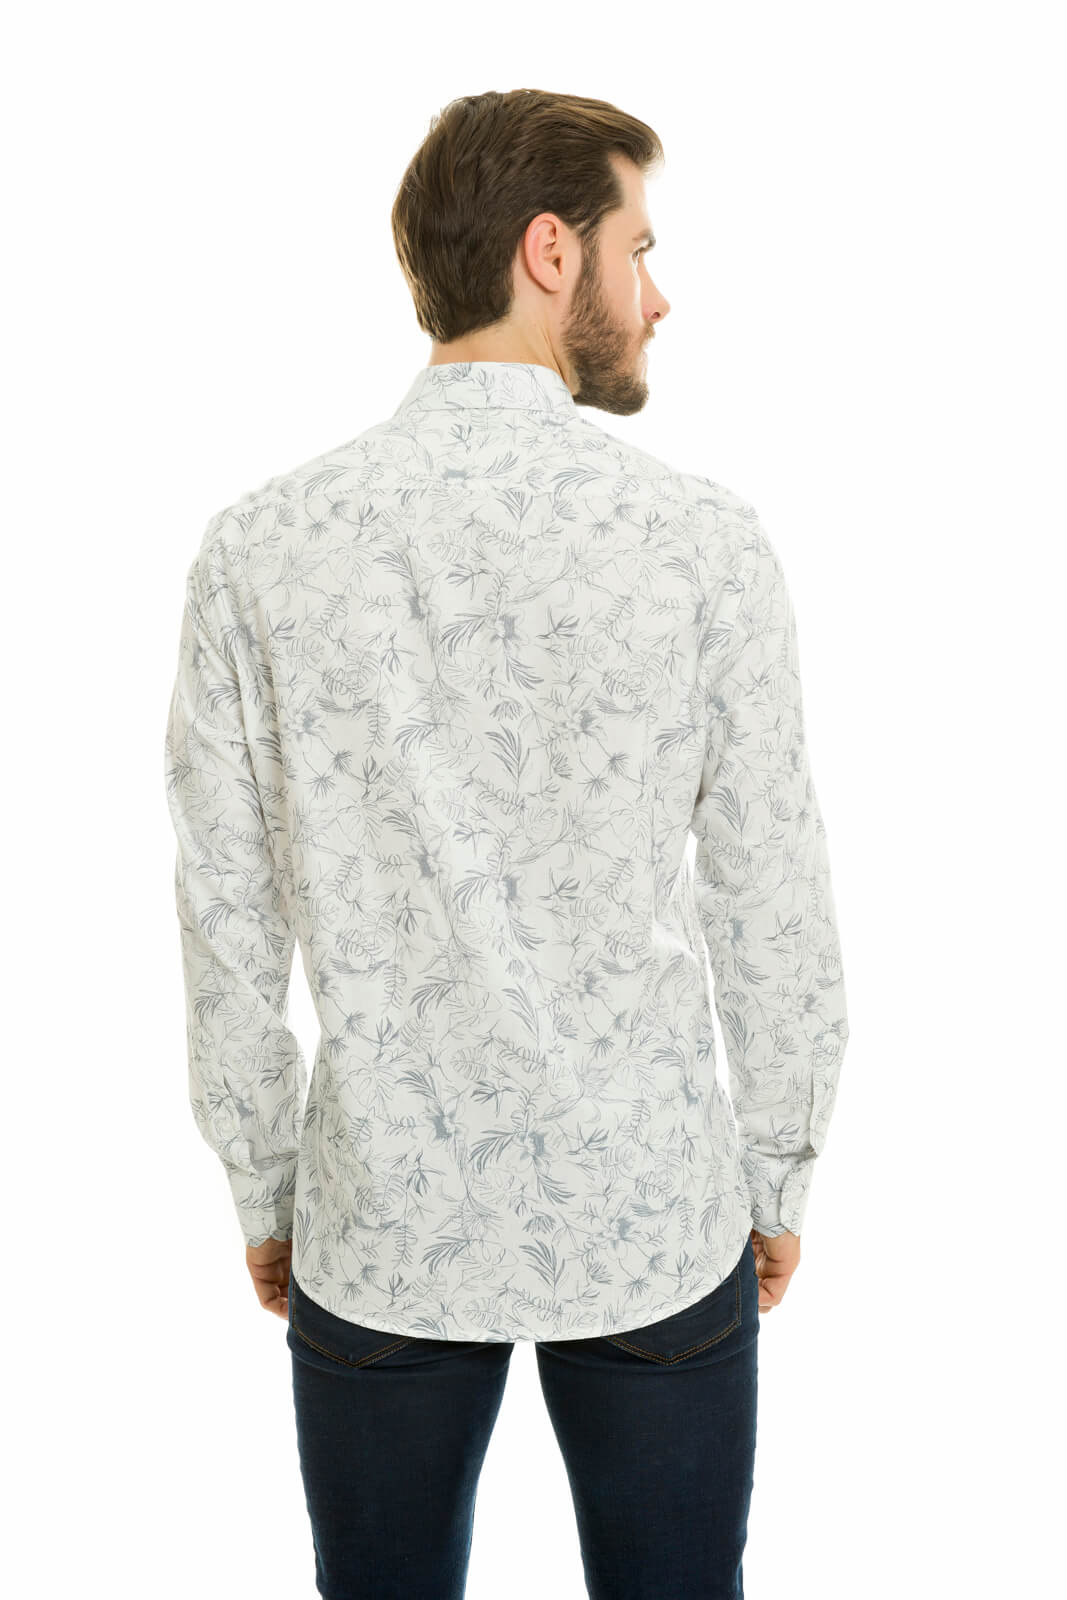 Camisa Social Masculina Slim Olimpo Algodão Floral Manga Longa EXG/6